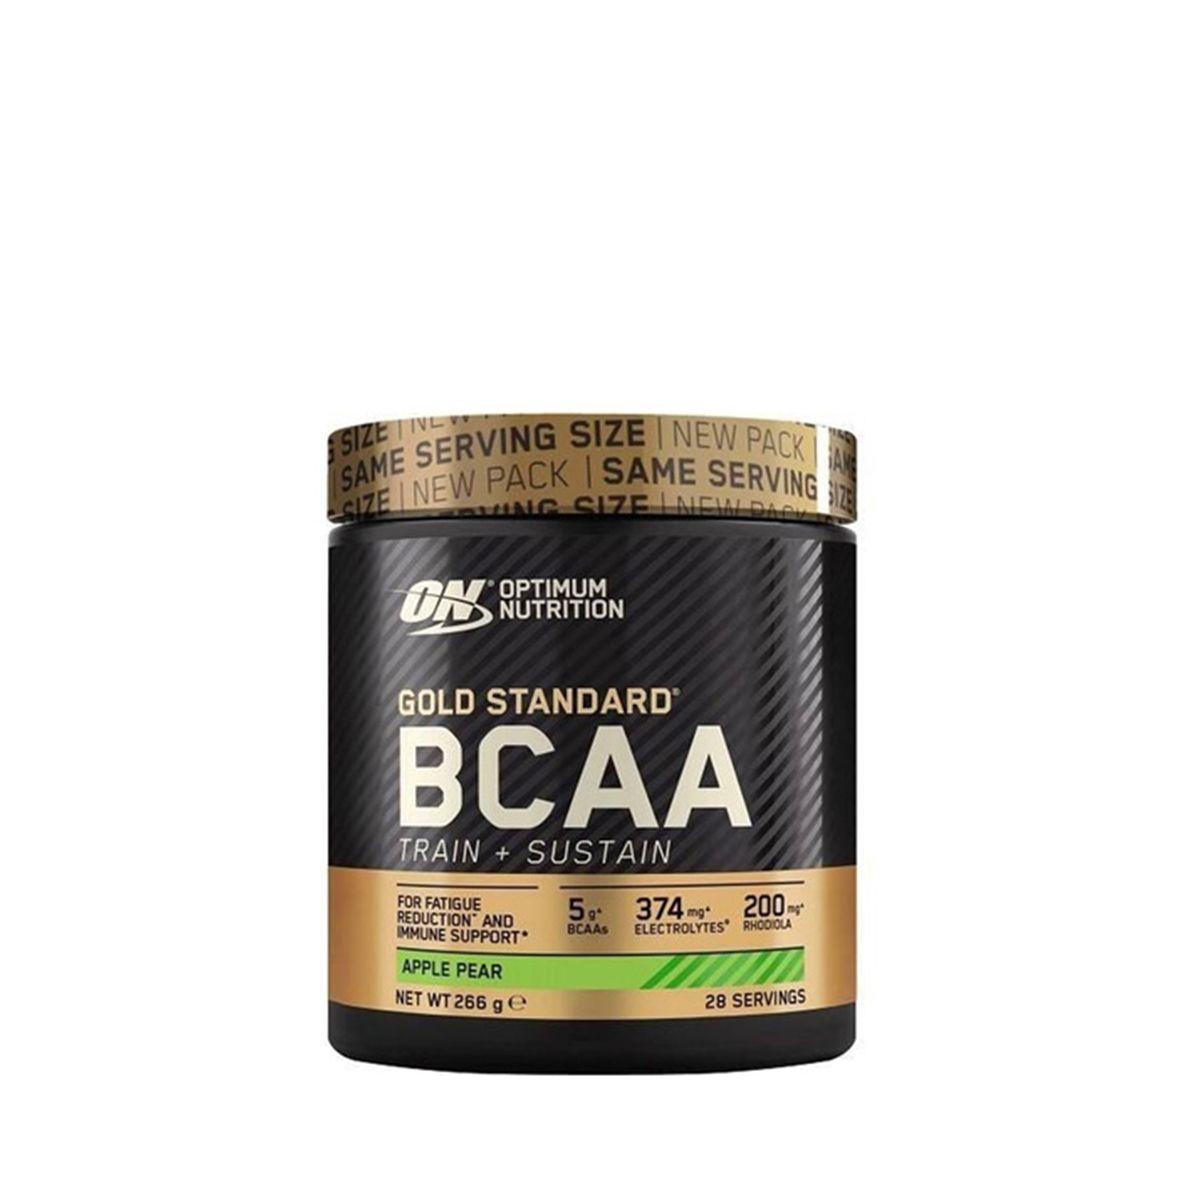 OPTIMUM NUTRITION - GOLD STANDARD BCAA - TRAIN+SUSTAIN - 266 G